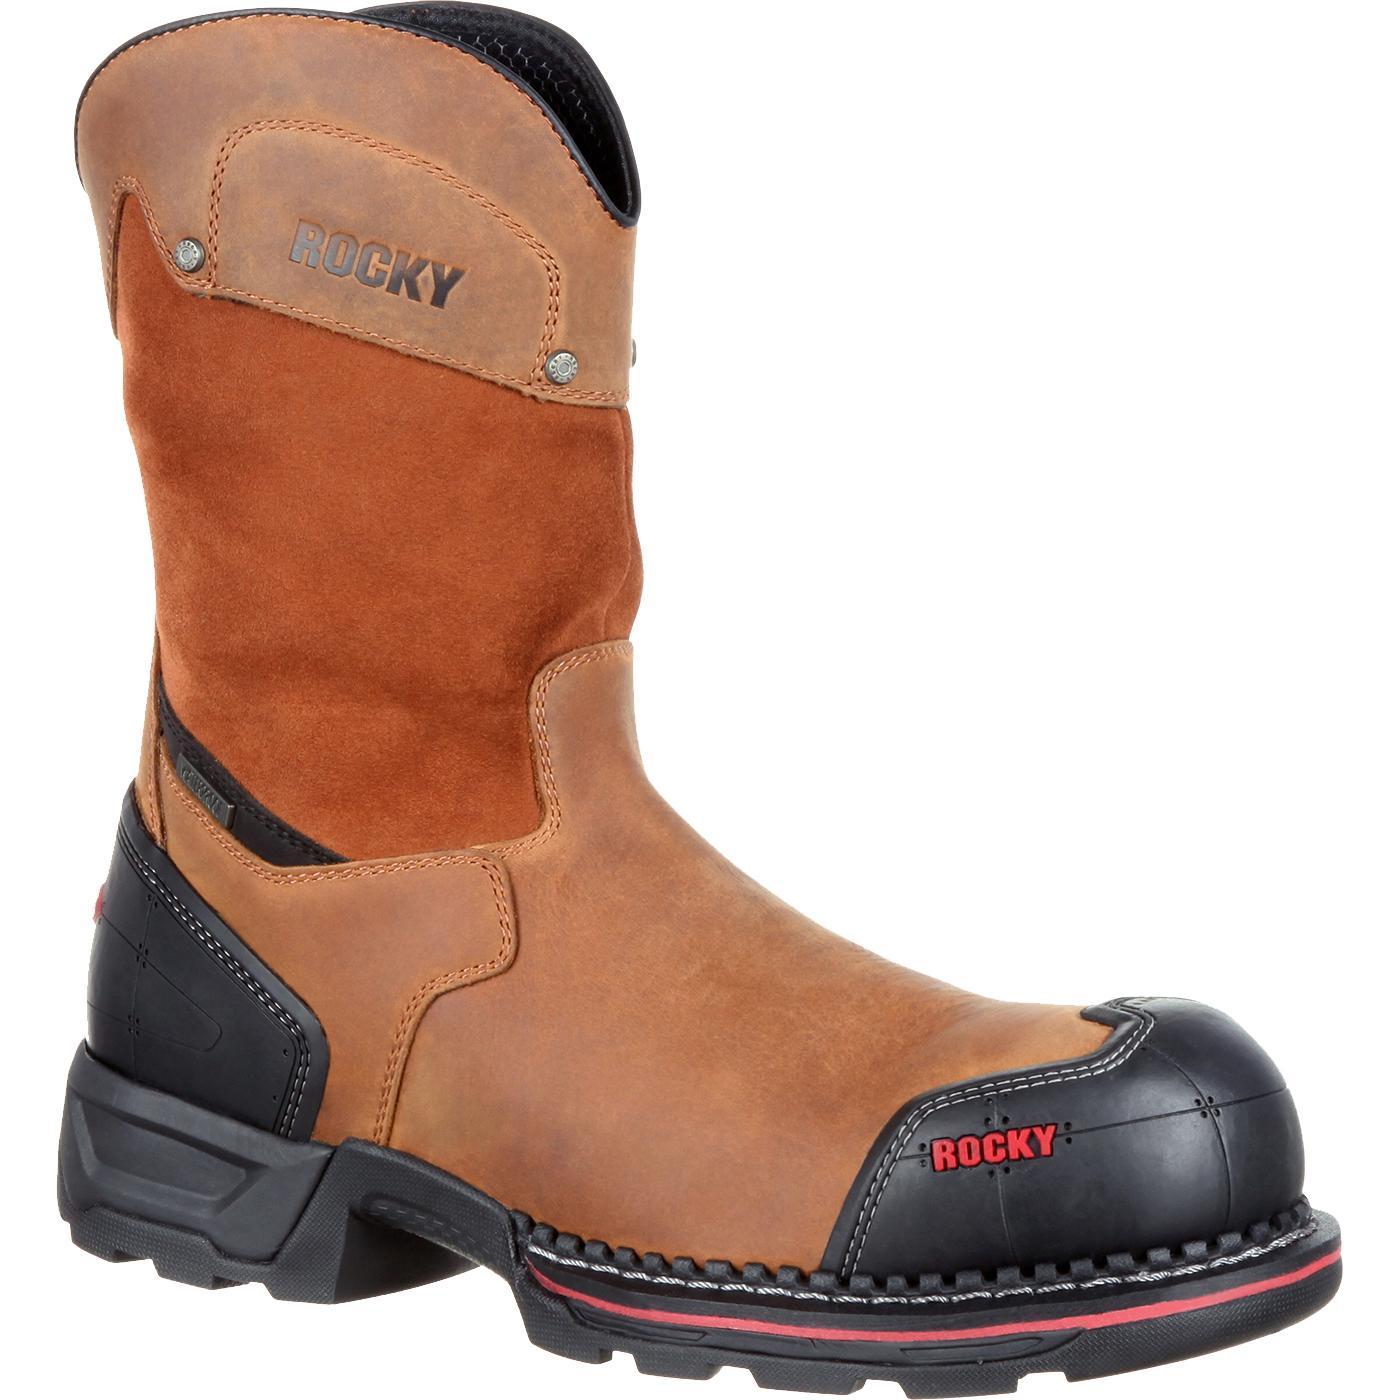 Rocky Maxx: Men's Pull-On Composite Toe Waterproof Work Boots